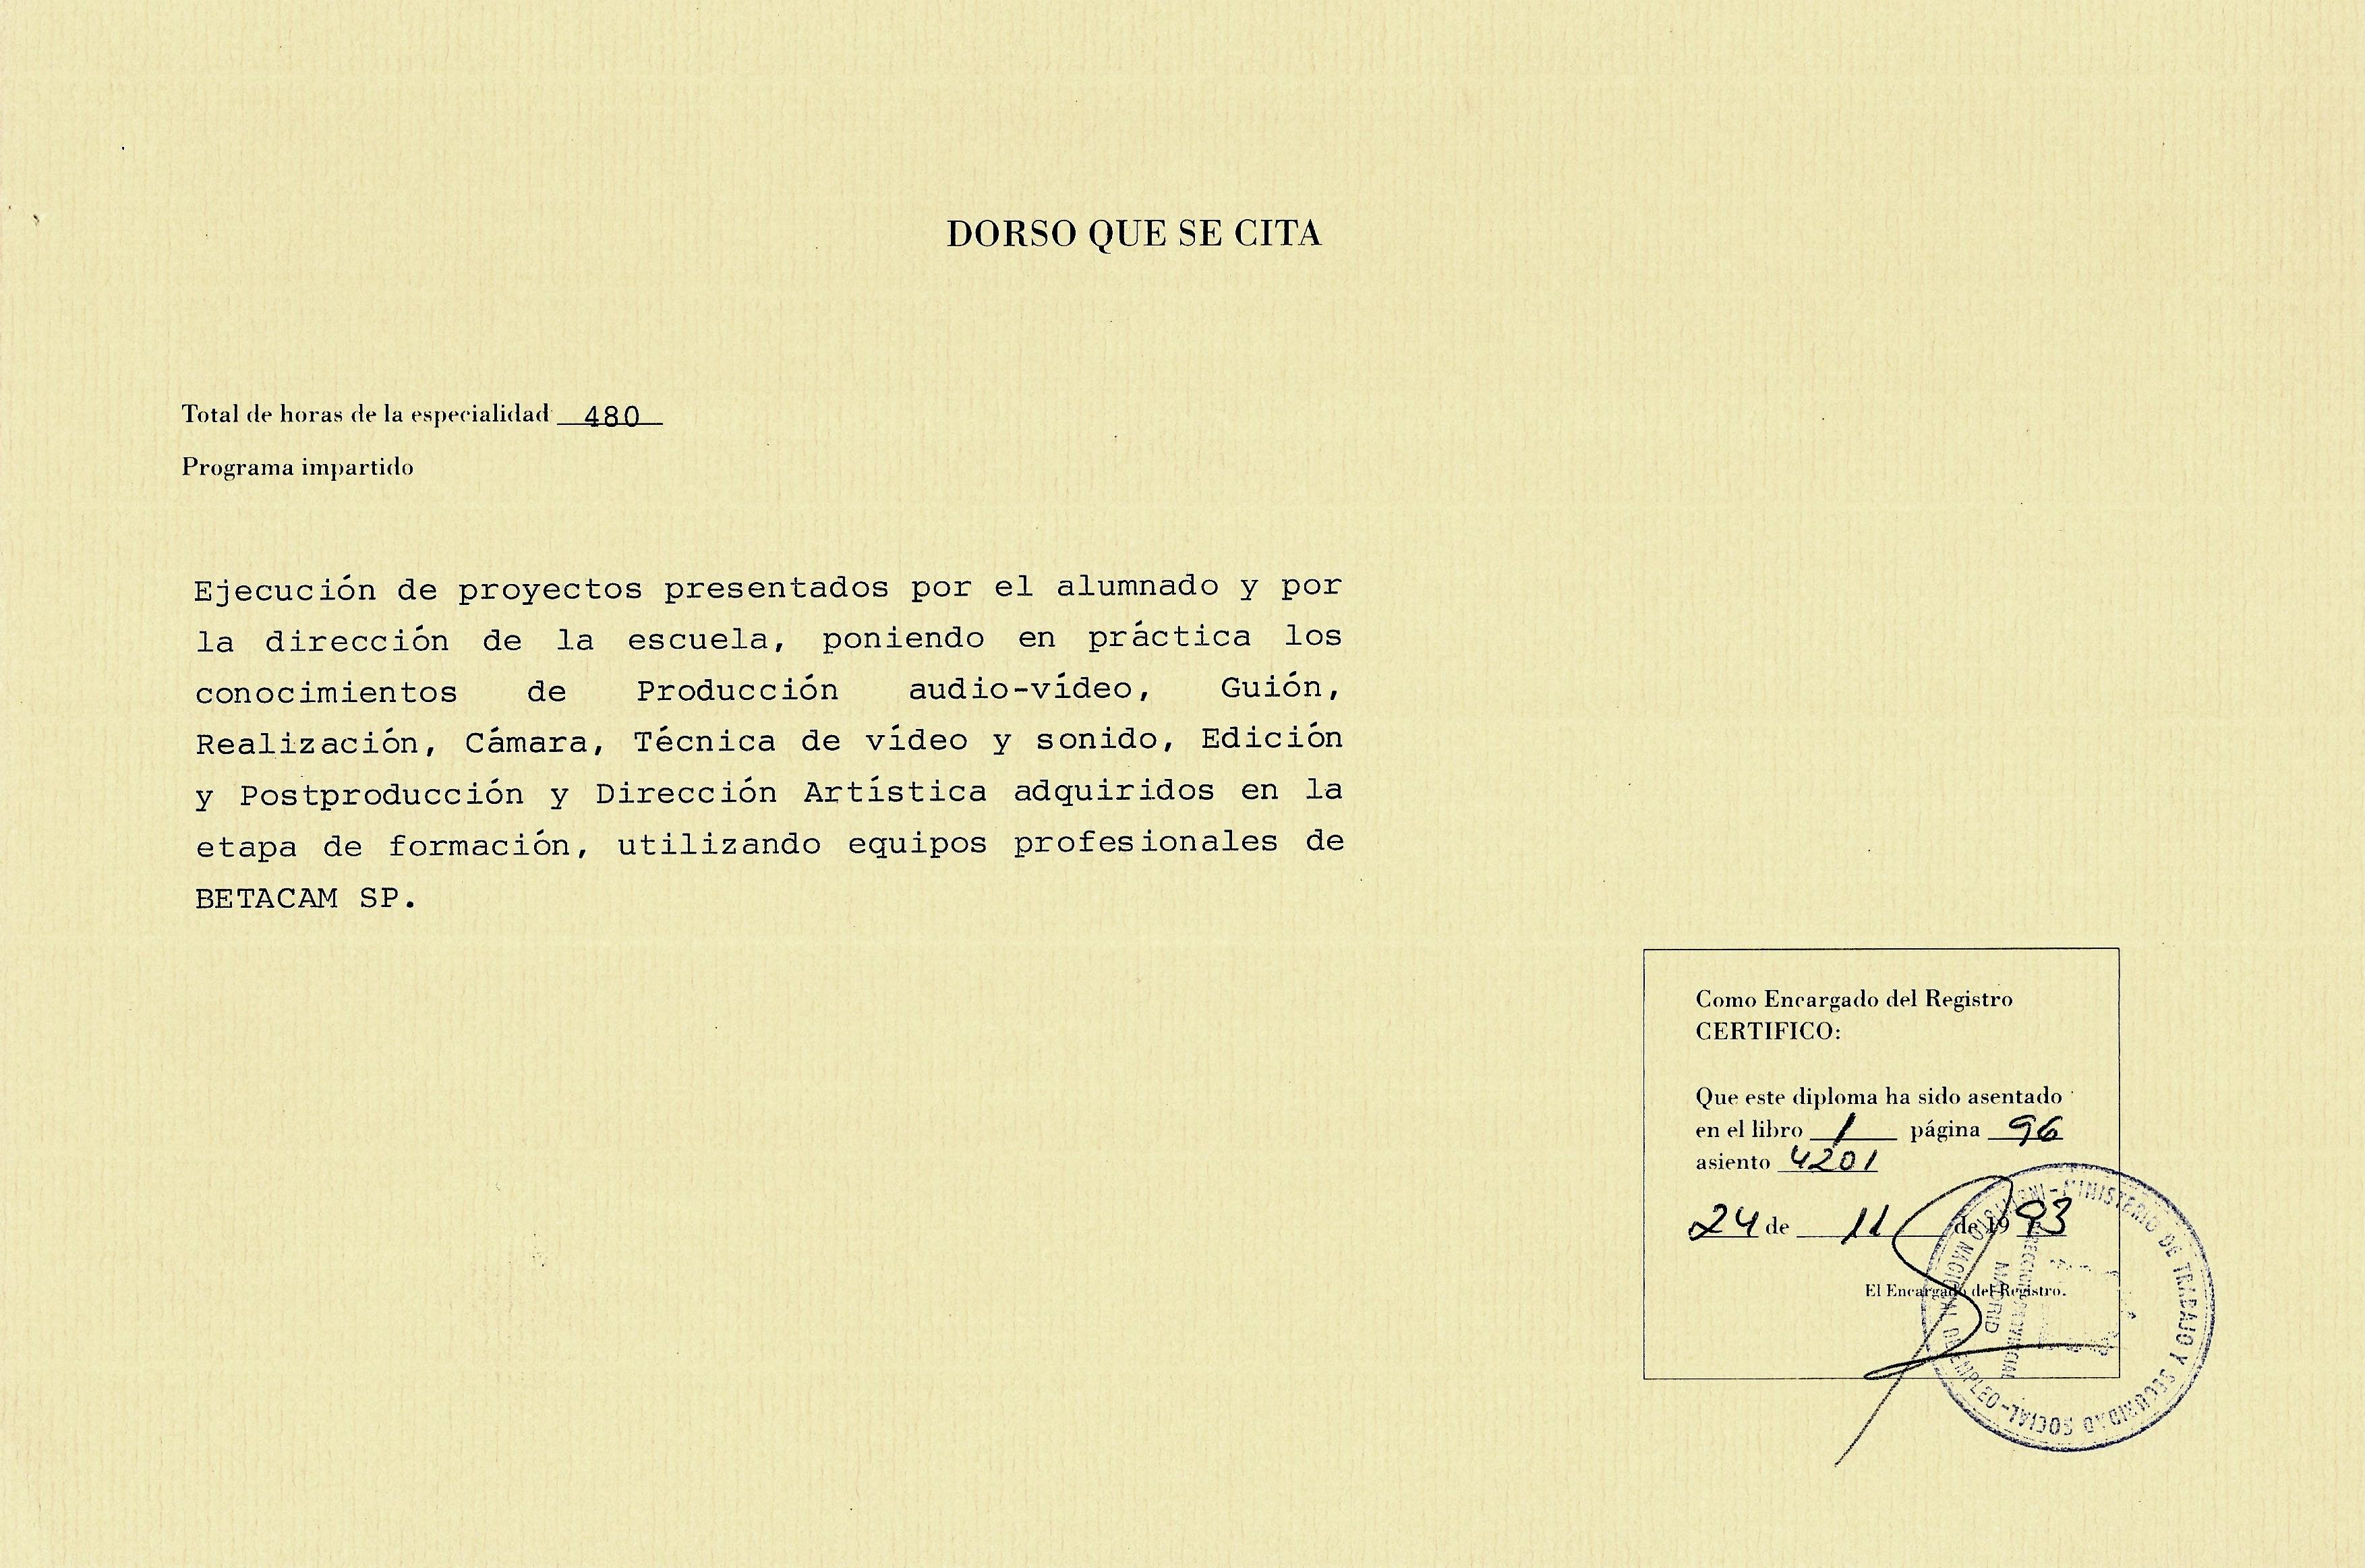 CURSO DE VIDEO PROFESIONAL MINISTERIO DE TRABAJO REVERSO